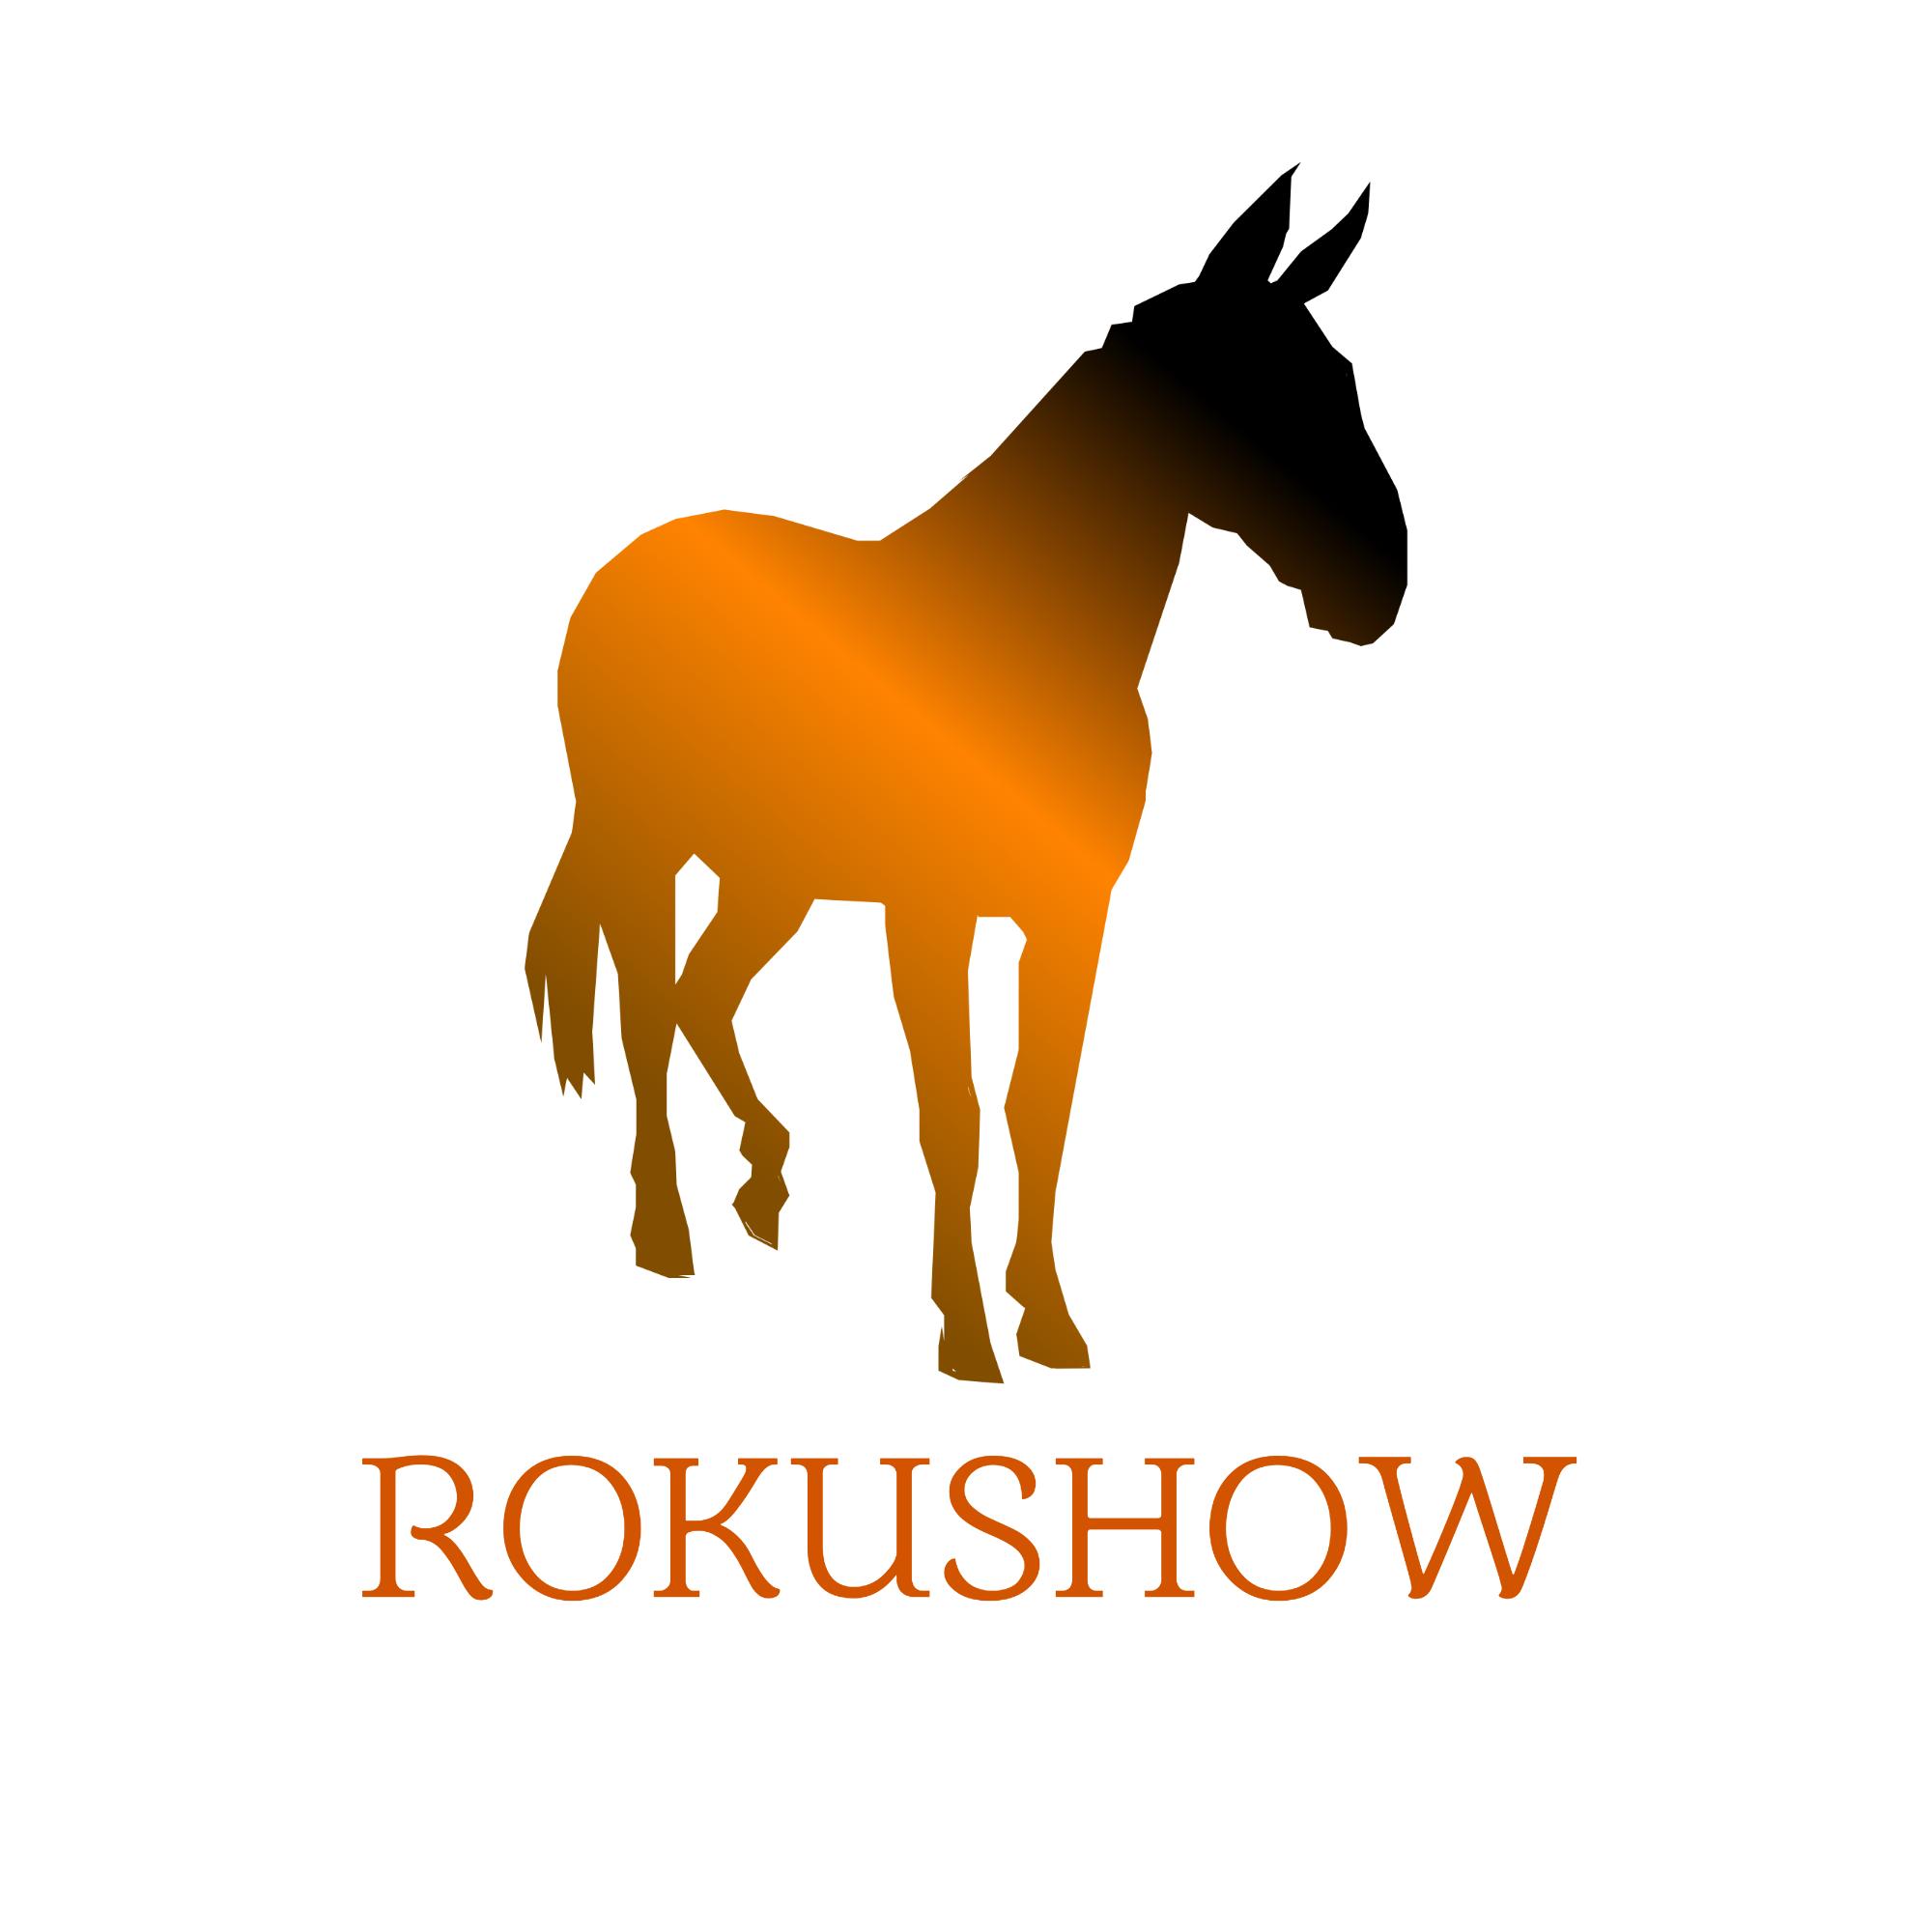 ROKUSHOW